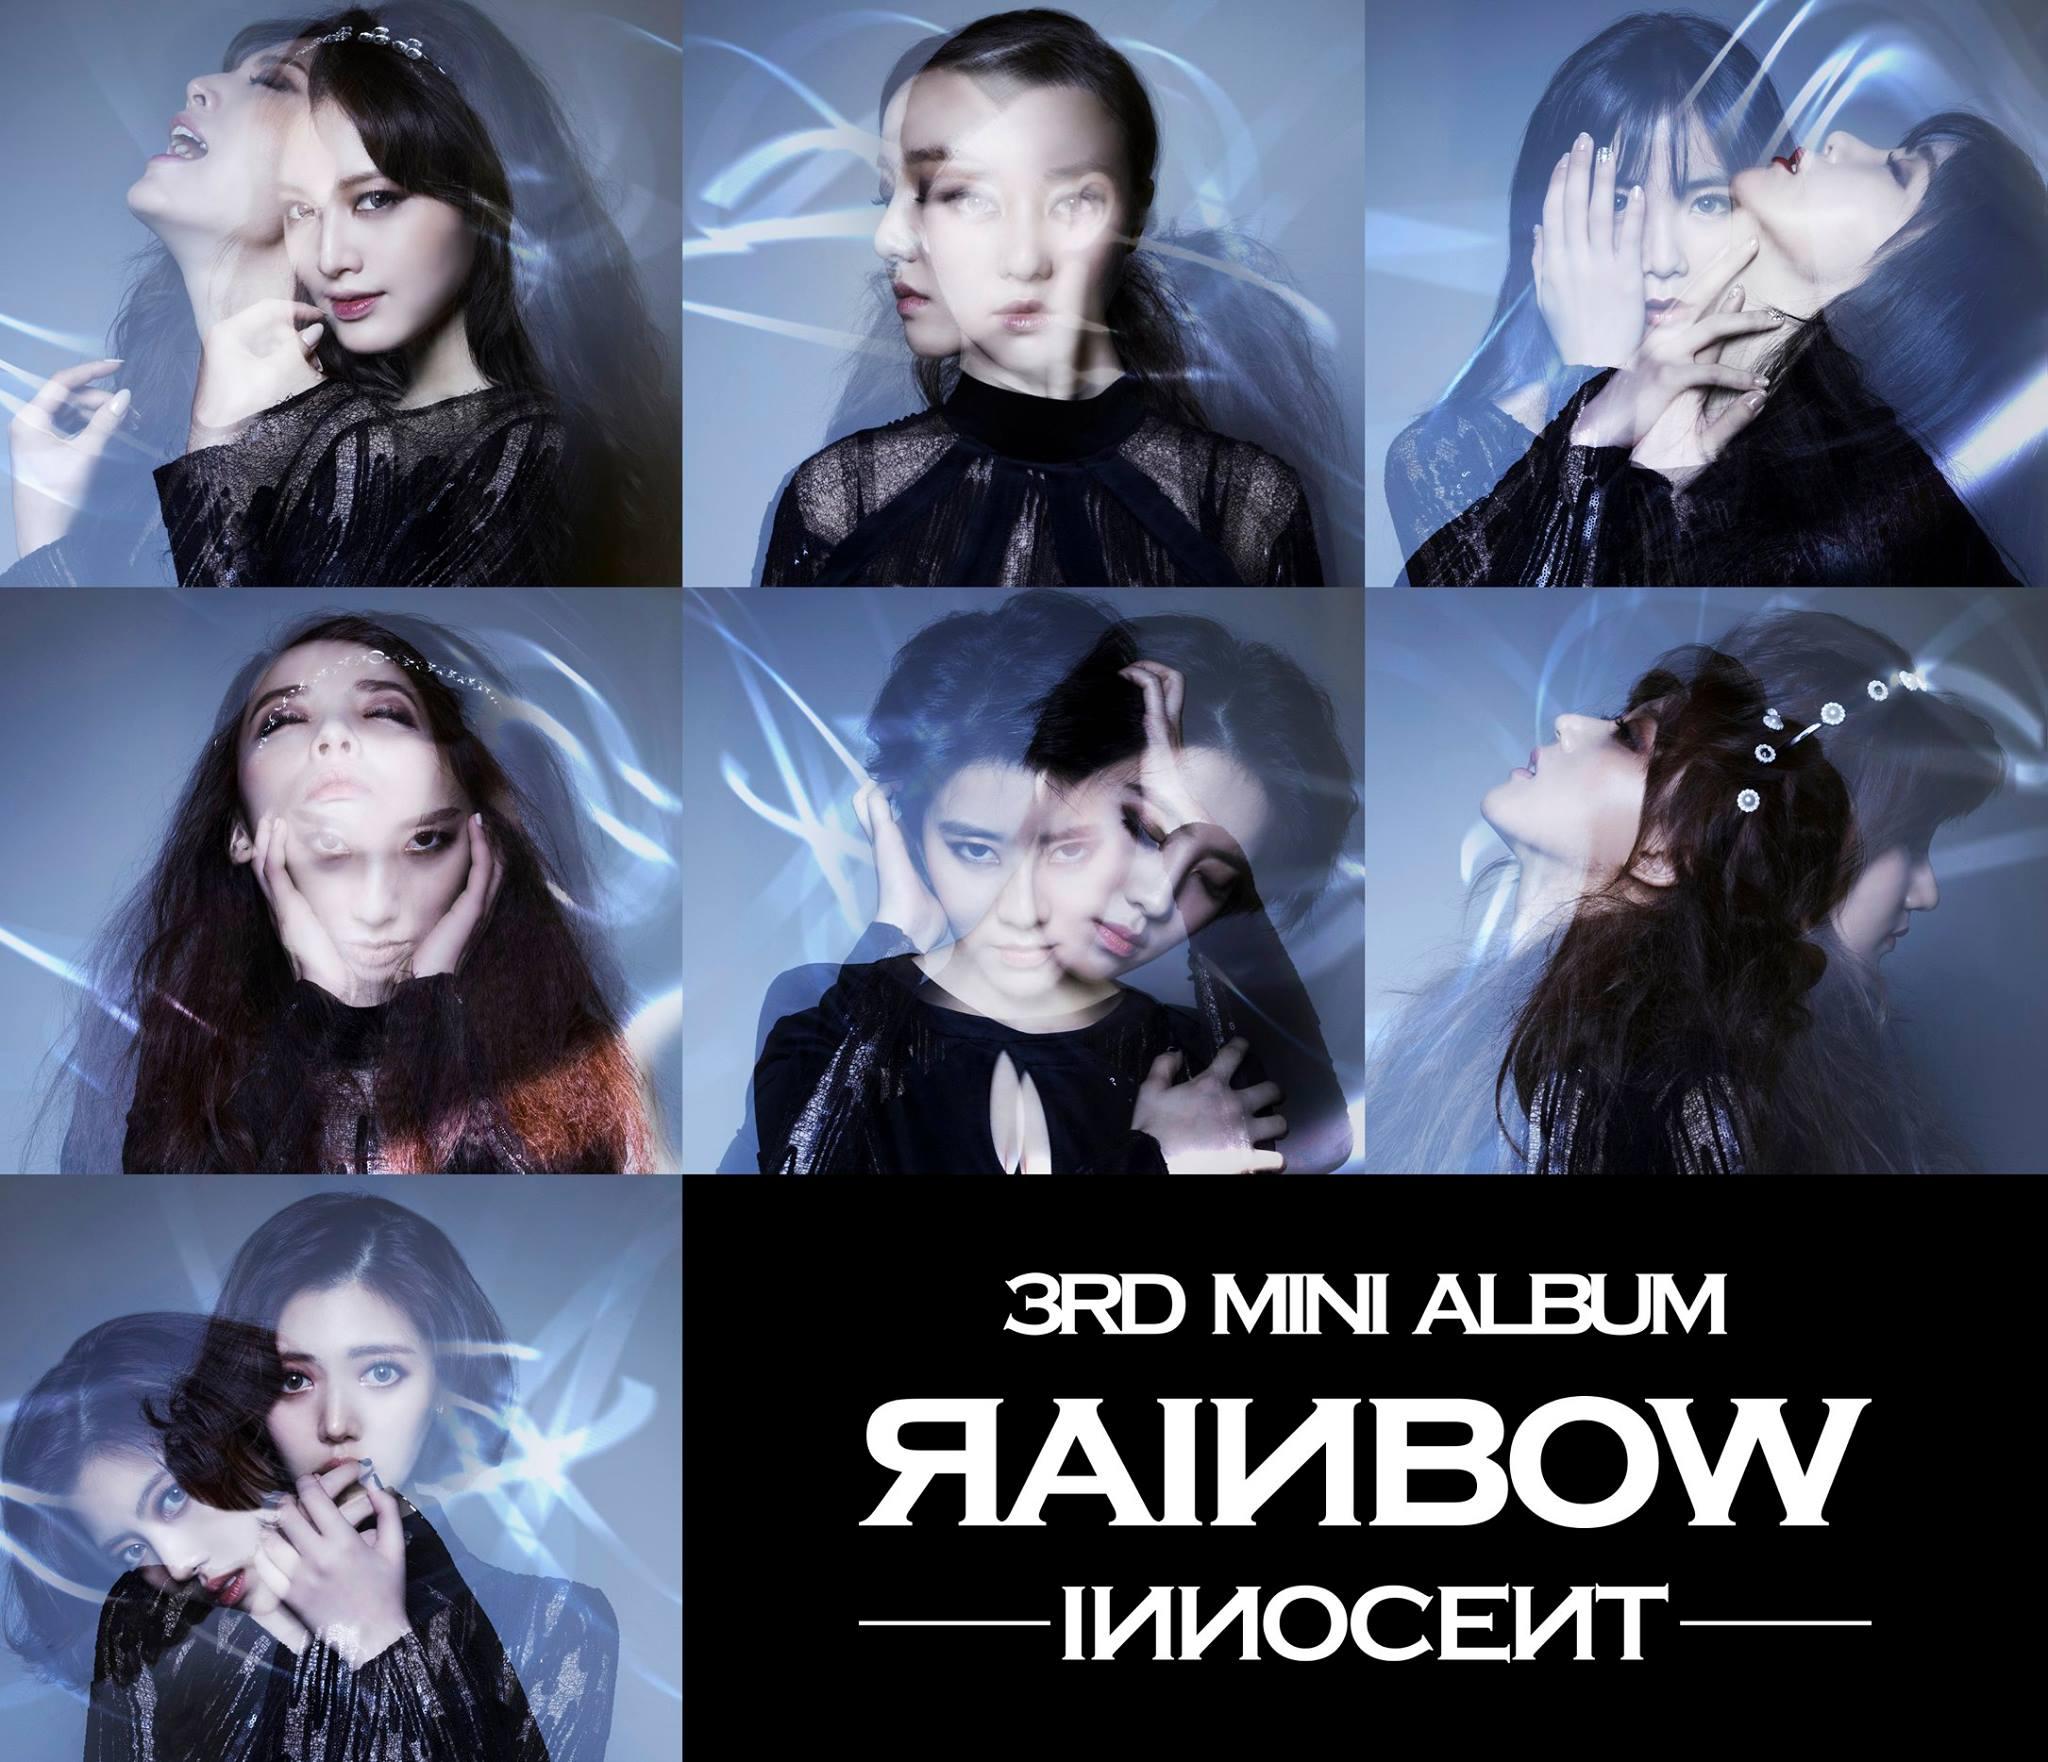 2. Rainbow 2009年出道約6年2個月